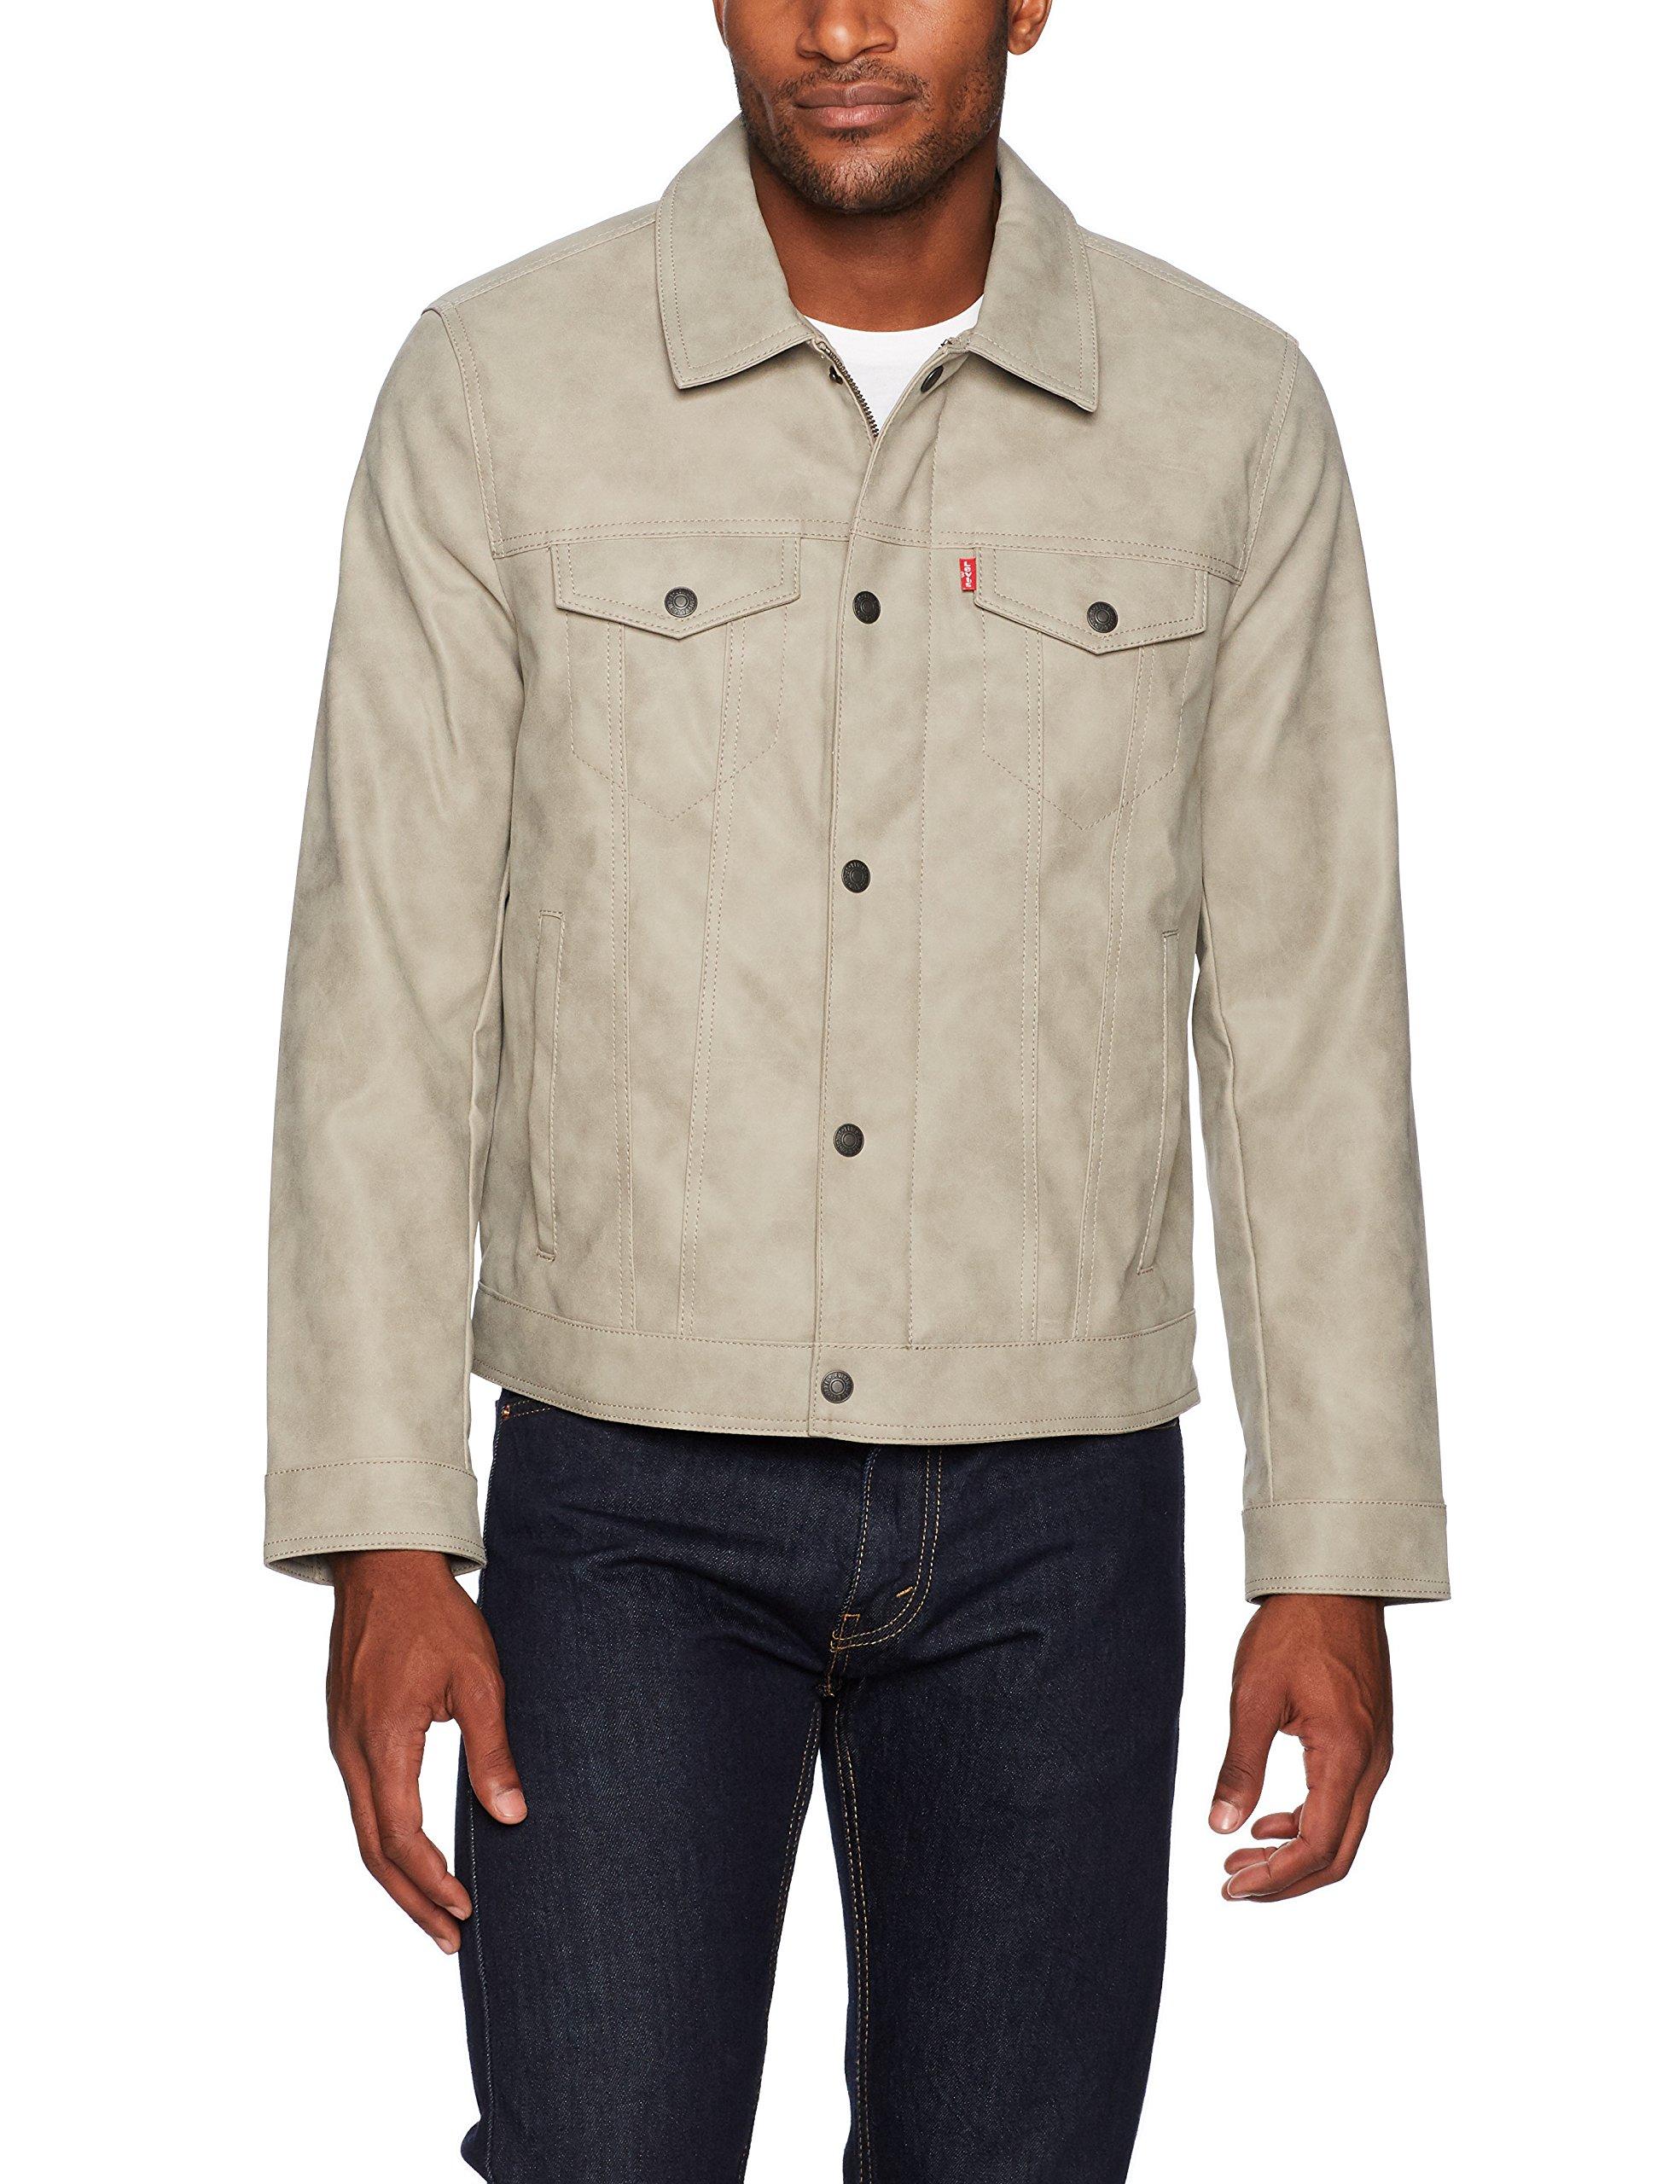 Levi's Men's Suede Touch Trucker Jacket, Light Grey, Medium